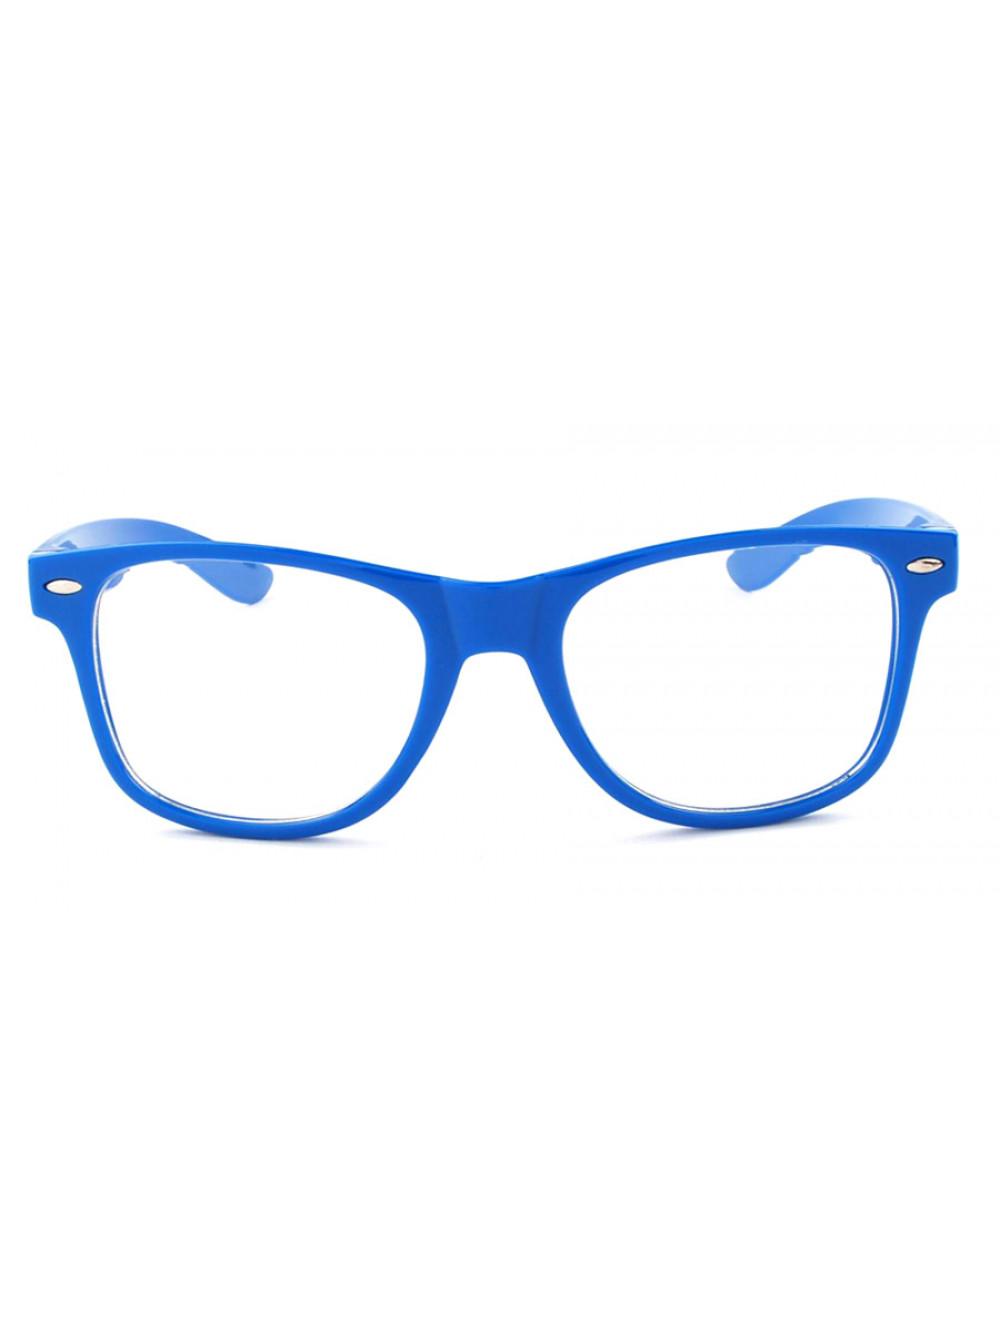 Okuliare Wayfarer Blue Nerd 42bd92176e8